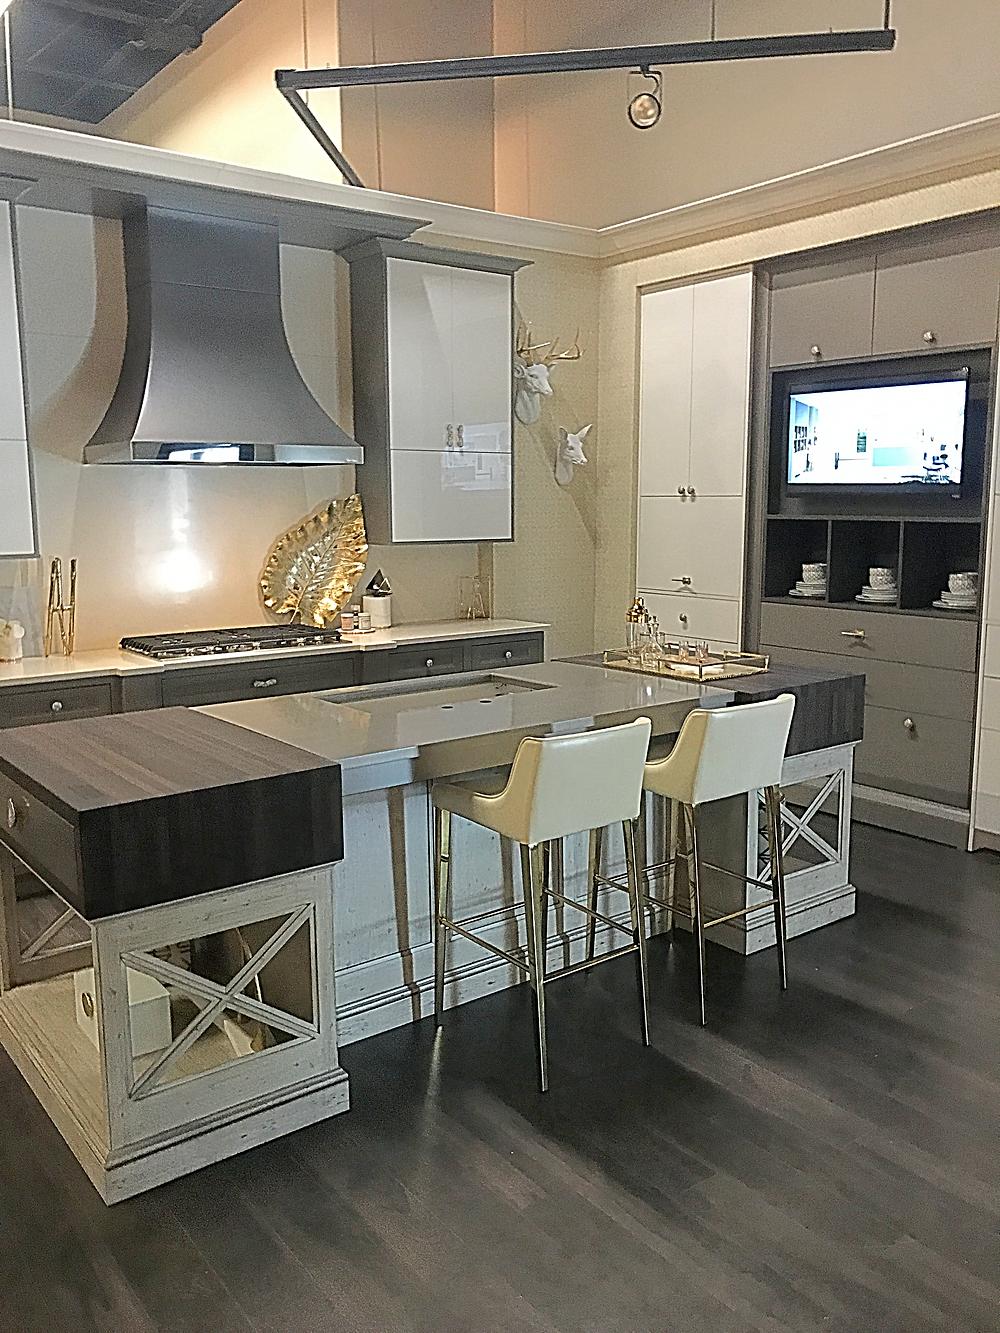 Design-Craft & Yorktowne mixed display - Beautiful Kitchen